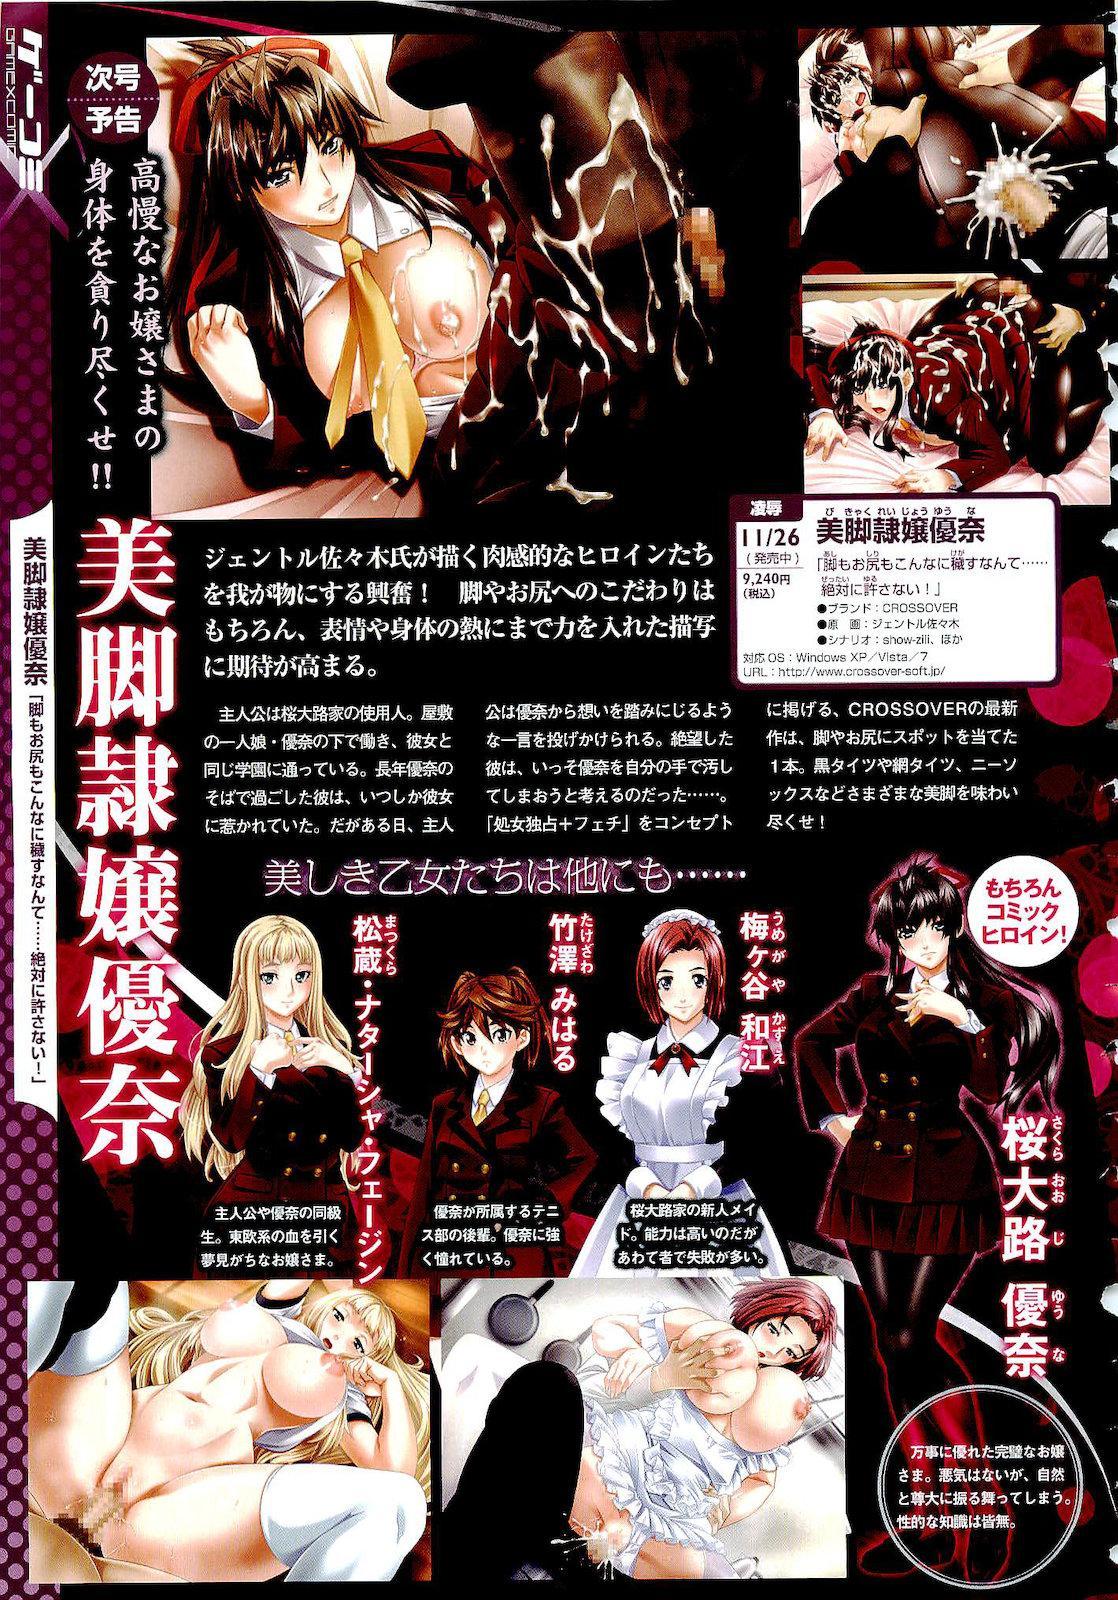 COMIC Megastore 2011-02 24